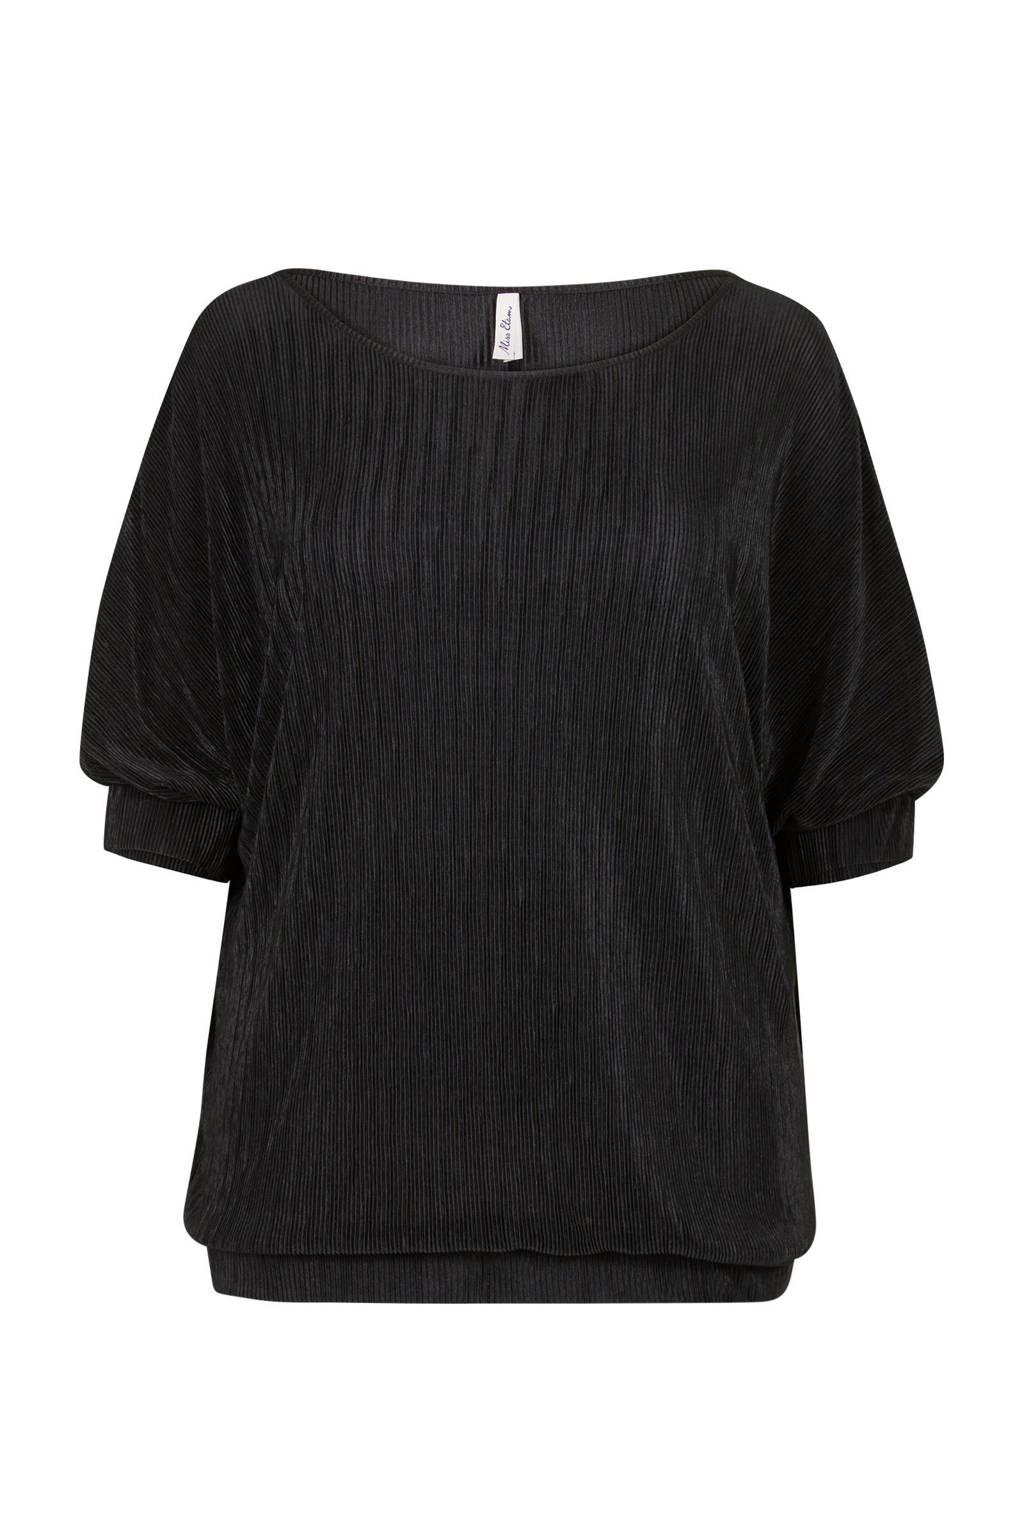 Miss Etam Plus top met rib afwerking zwart, Zwart